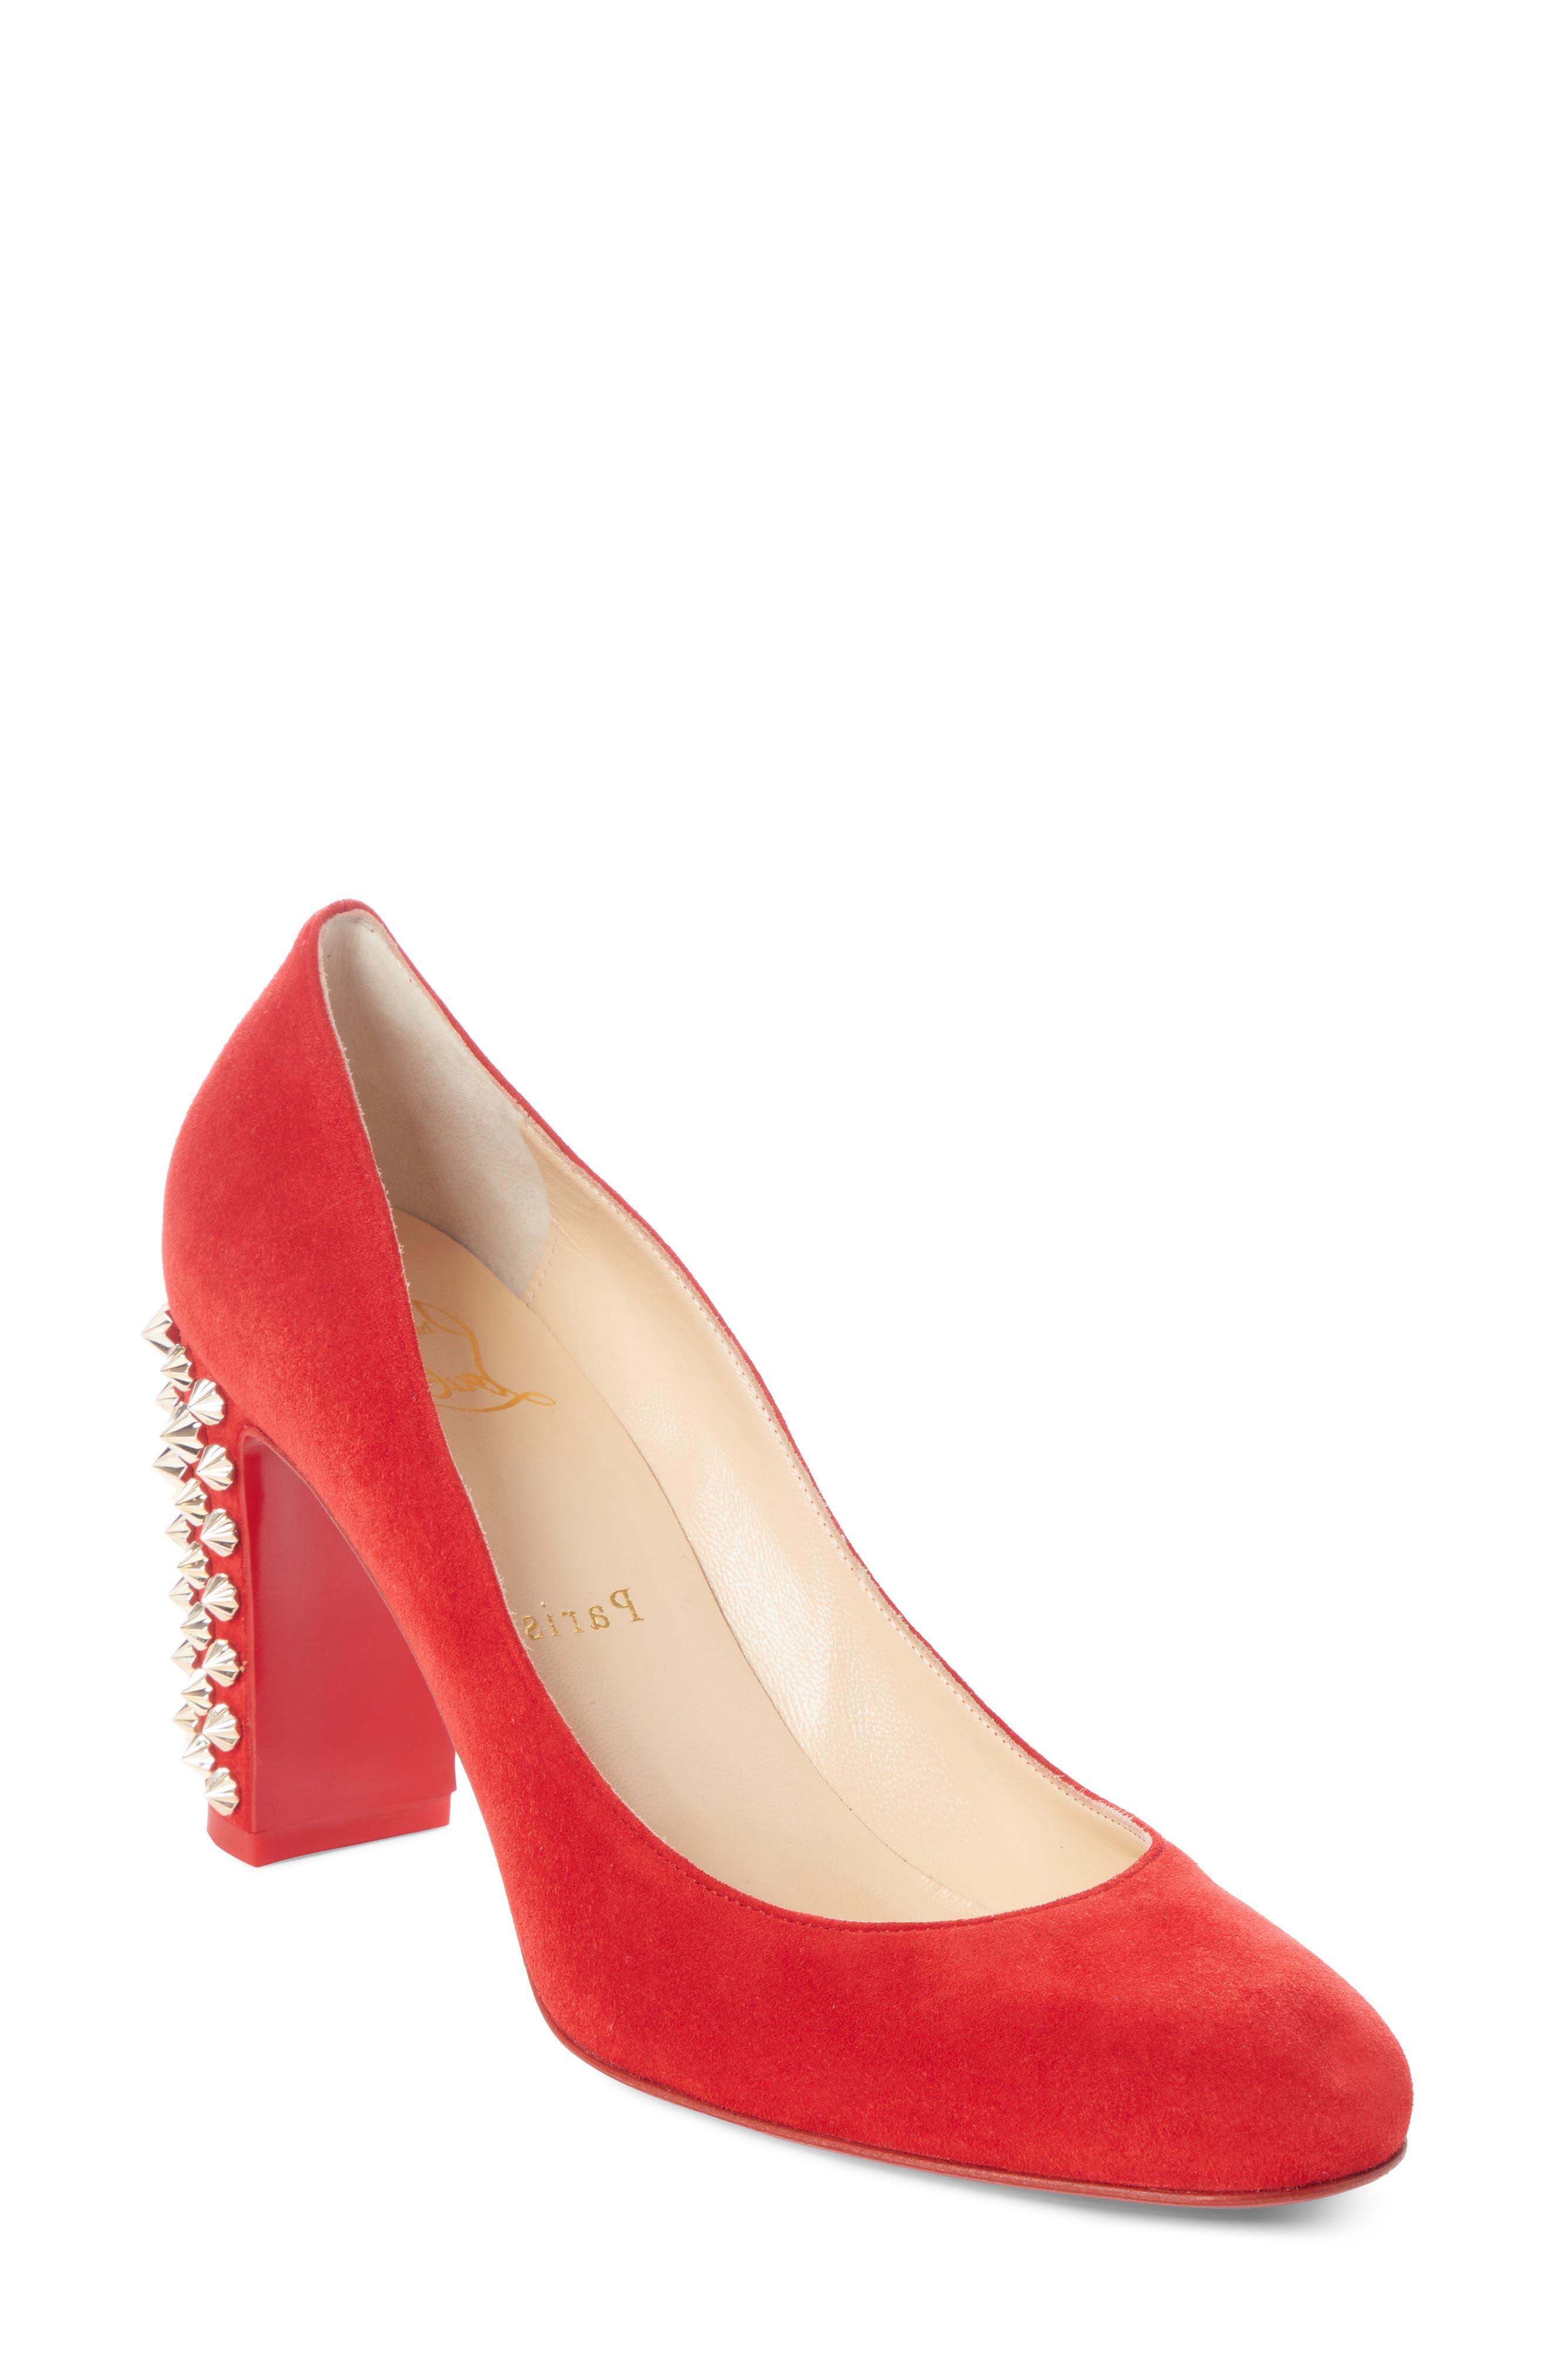 Christian Louboutin Marimalus Spike Heel Pump - Red